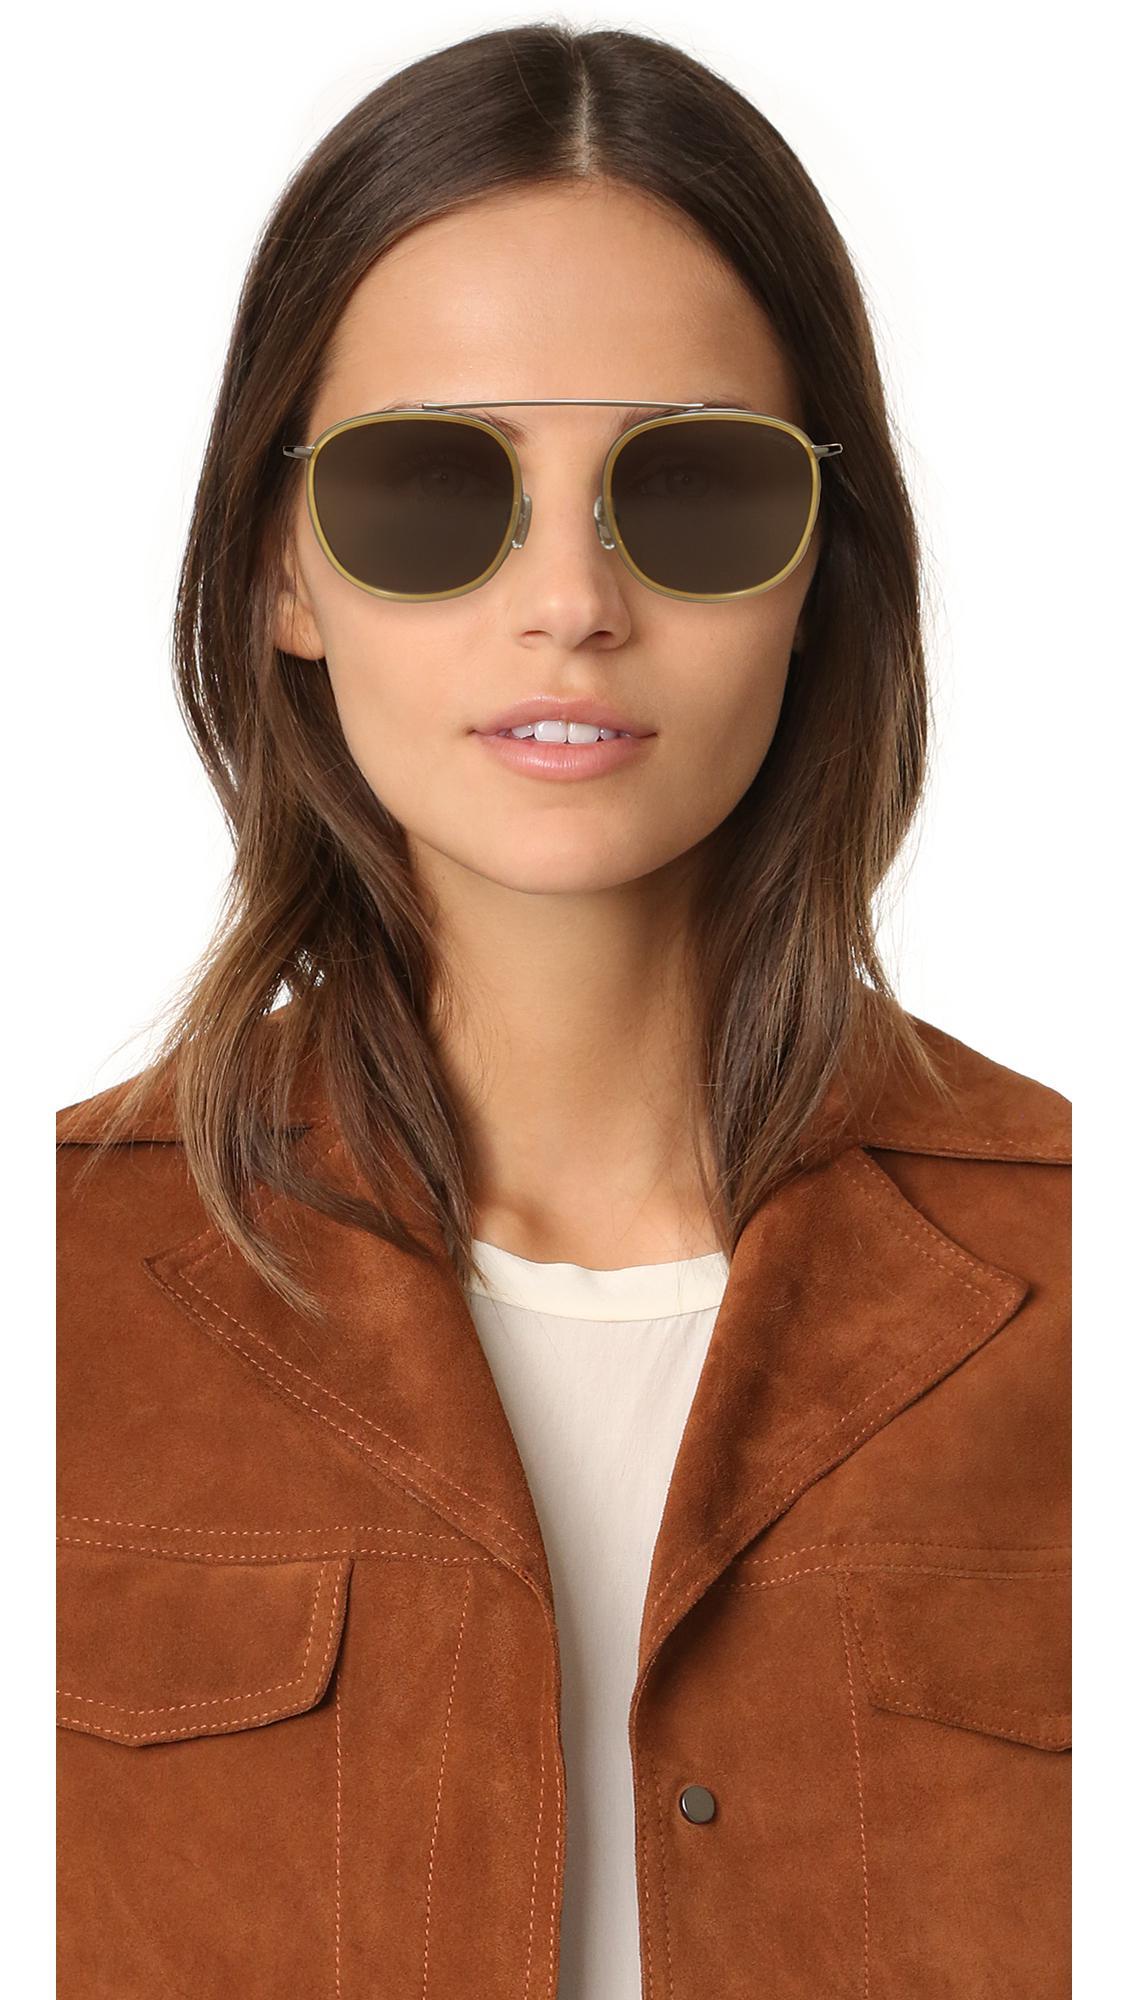 Illesteva Mykonos Ace Sunglasses in Grey